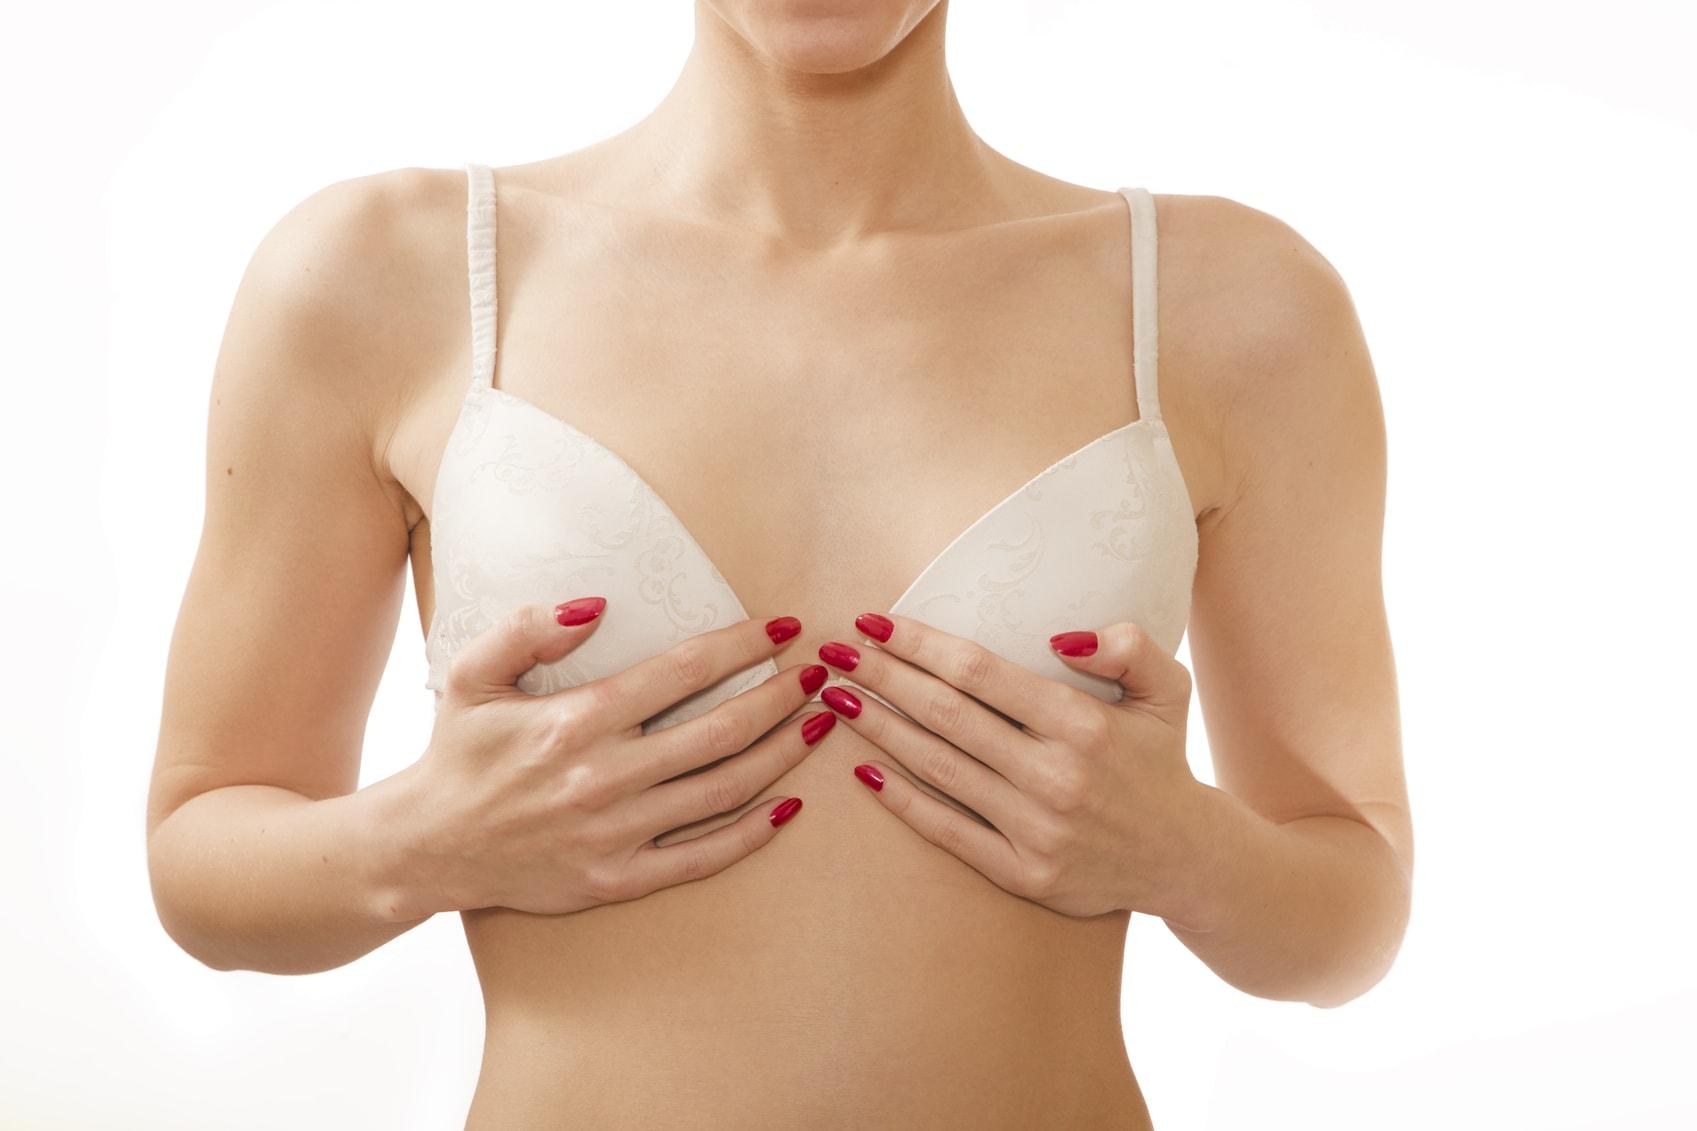 podprsenka drží prsia pokope